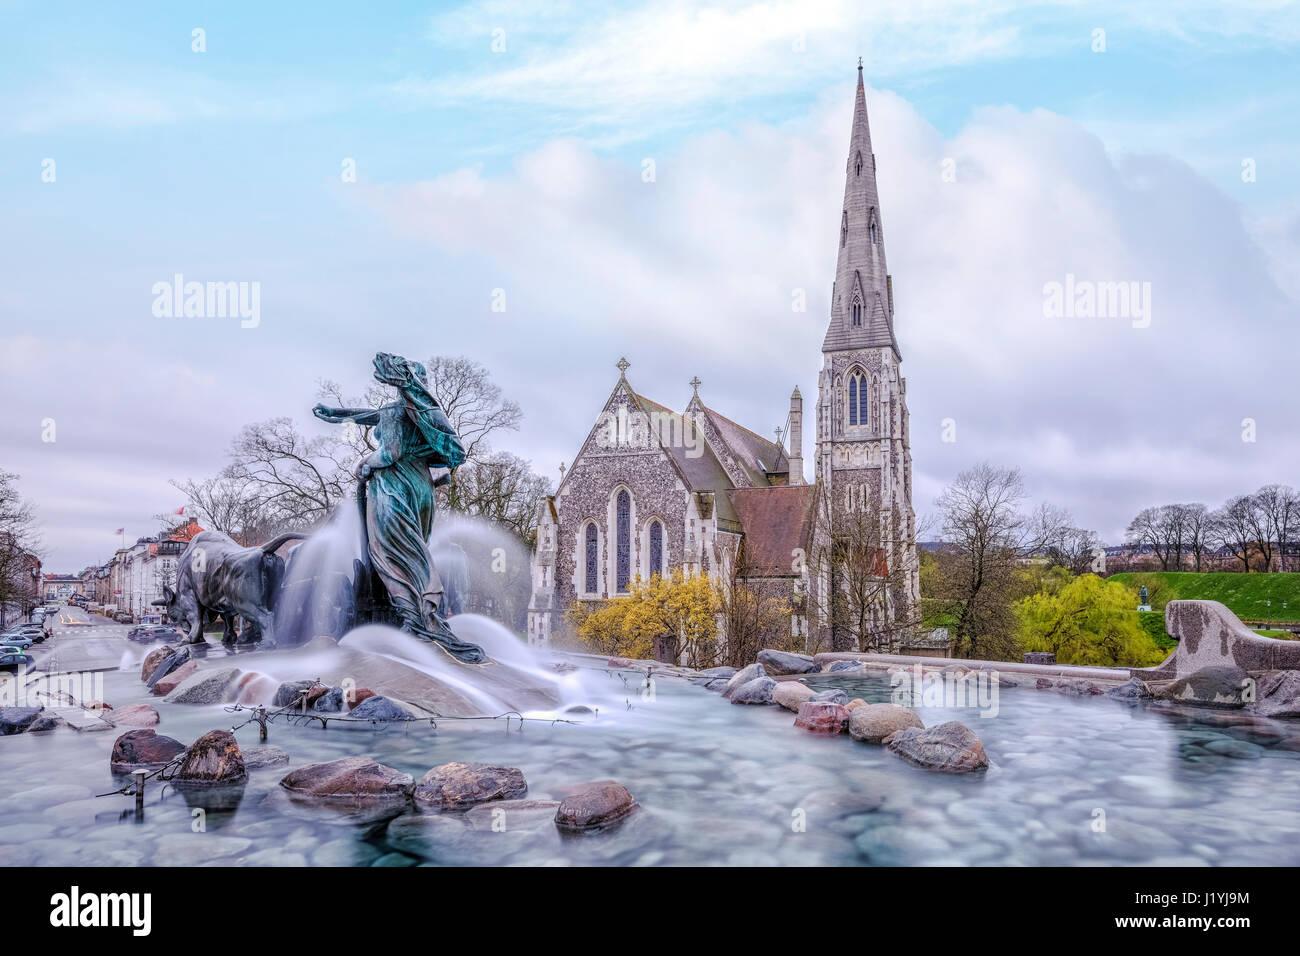 Gefion Fountain, St Alban's church, Copenhagen, Scandinavia, Denmark - Stock Image